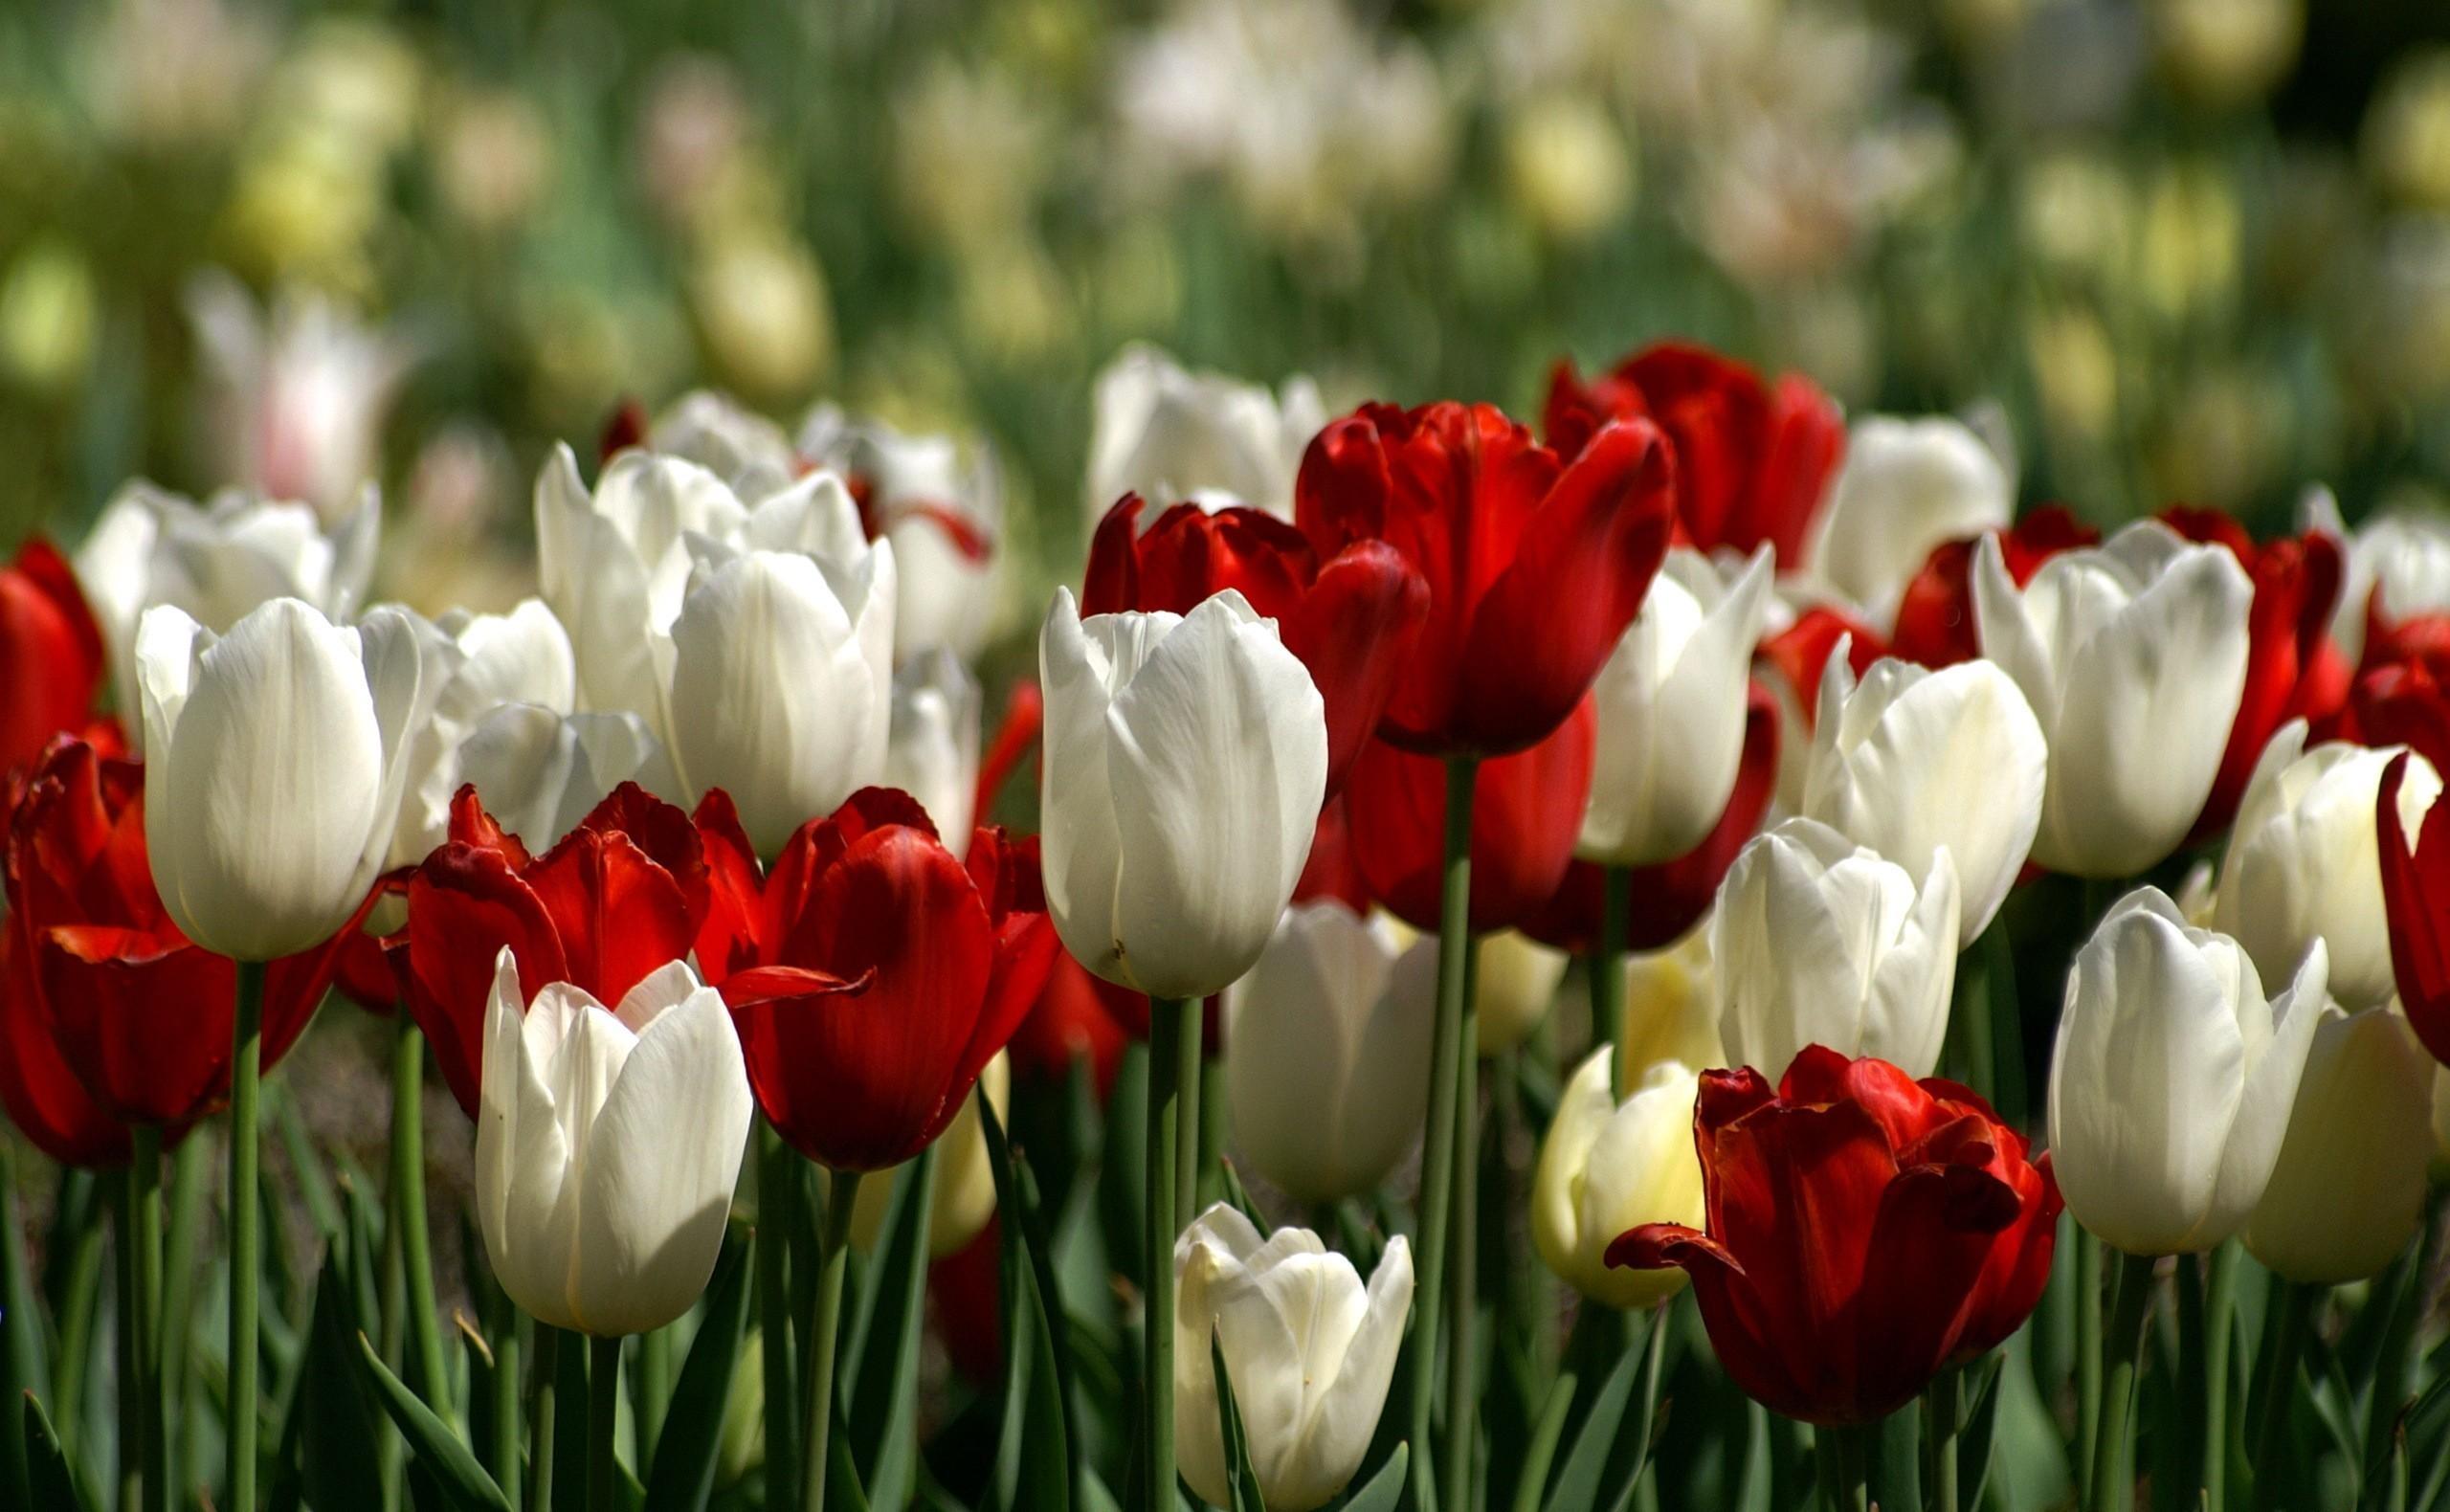 92950 descargar fondo de pantalla Flores, Cama De Flores, Parterre, Primavera, Tulipanes: protectores de pantalla e imágenes gratis